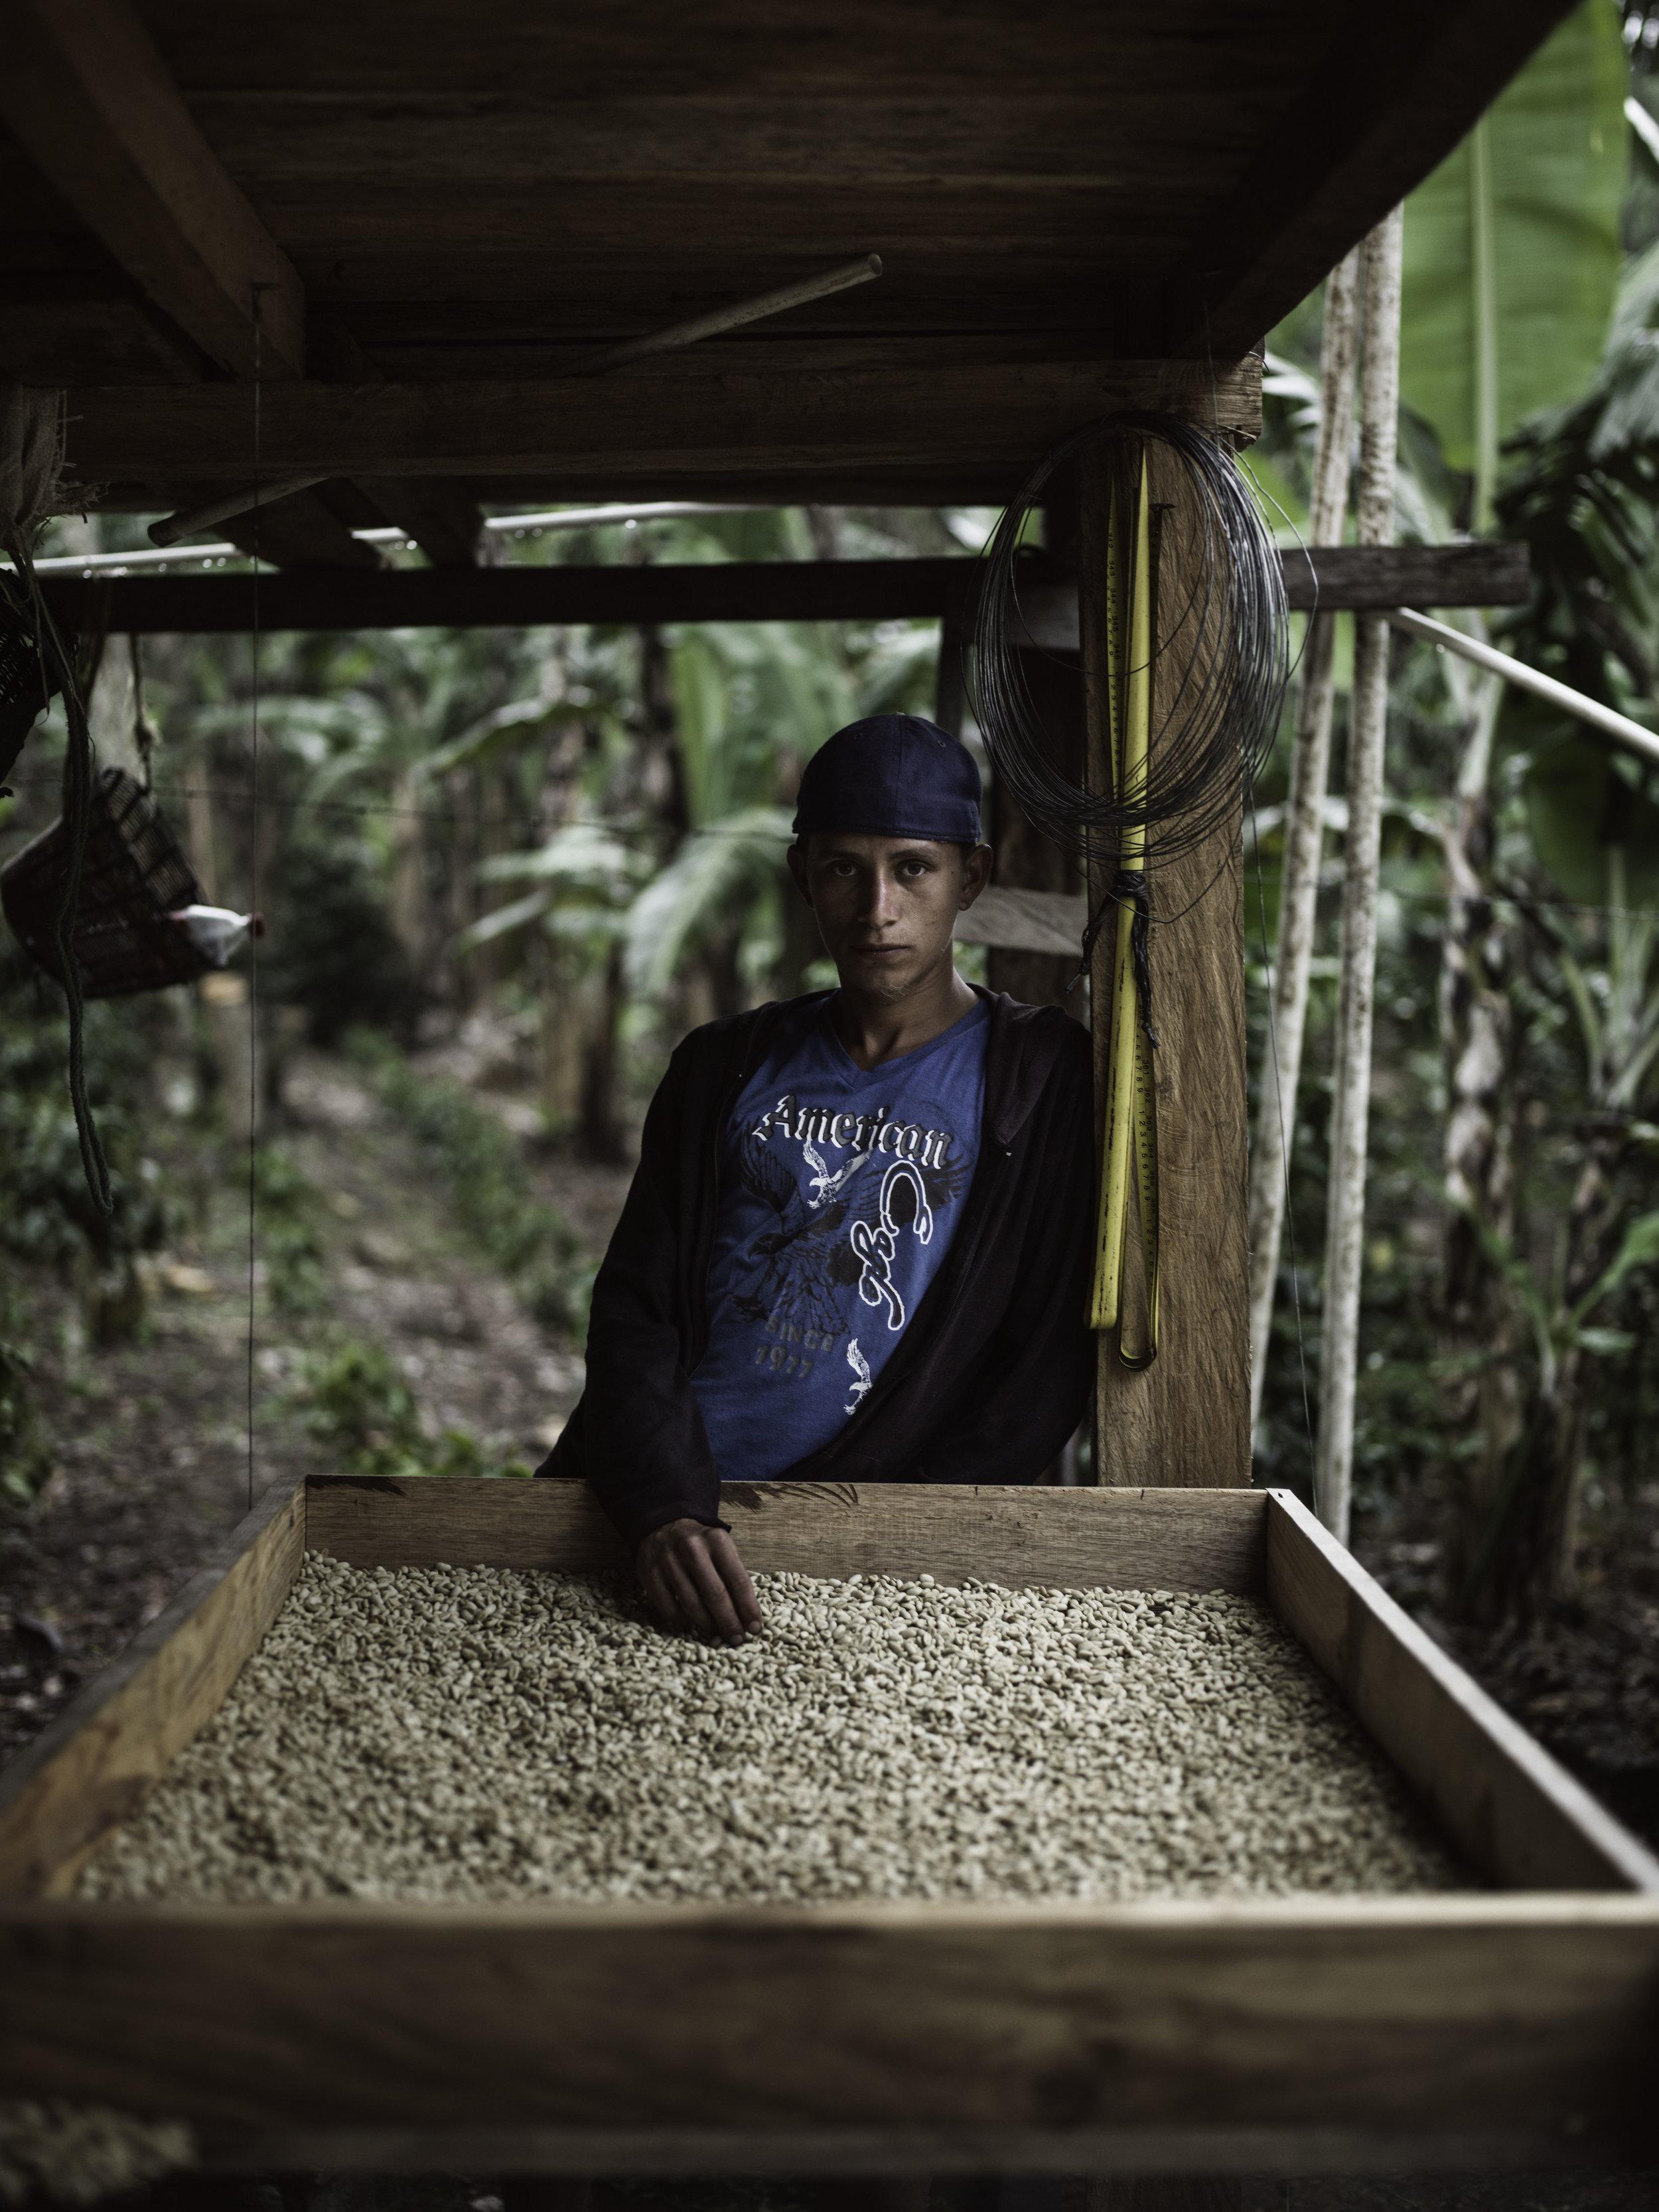 2014_03_06_tk_for_better_coffee_honduras_hasselblad-21_final.jpg